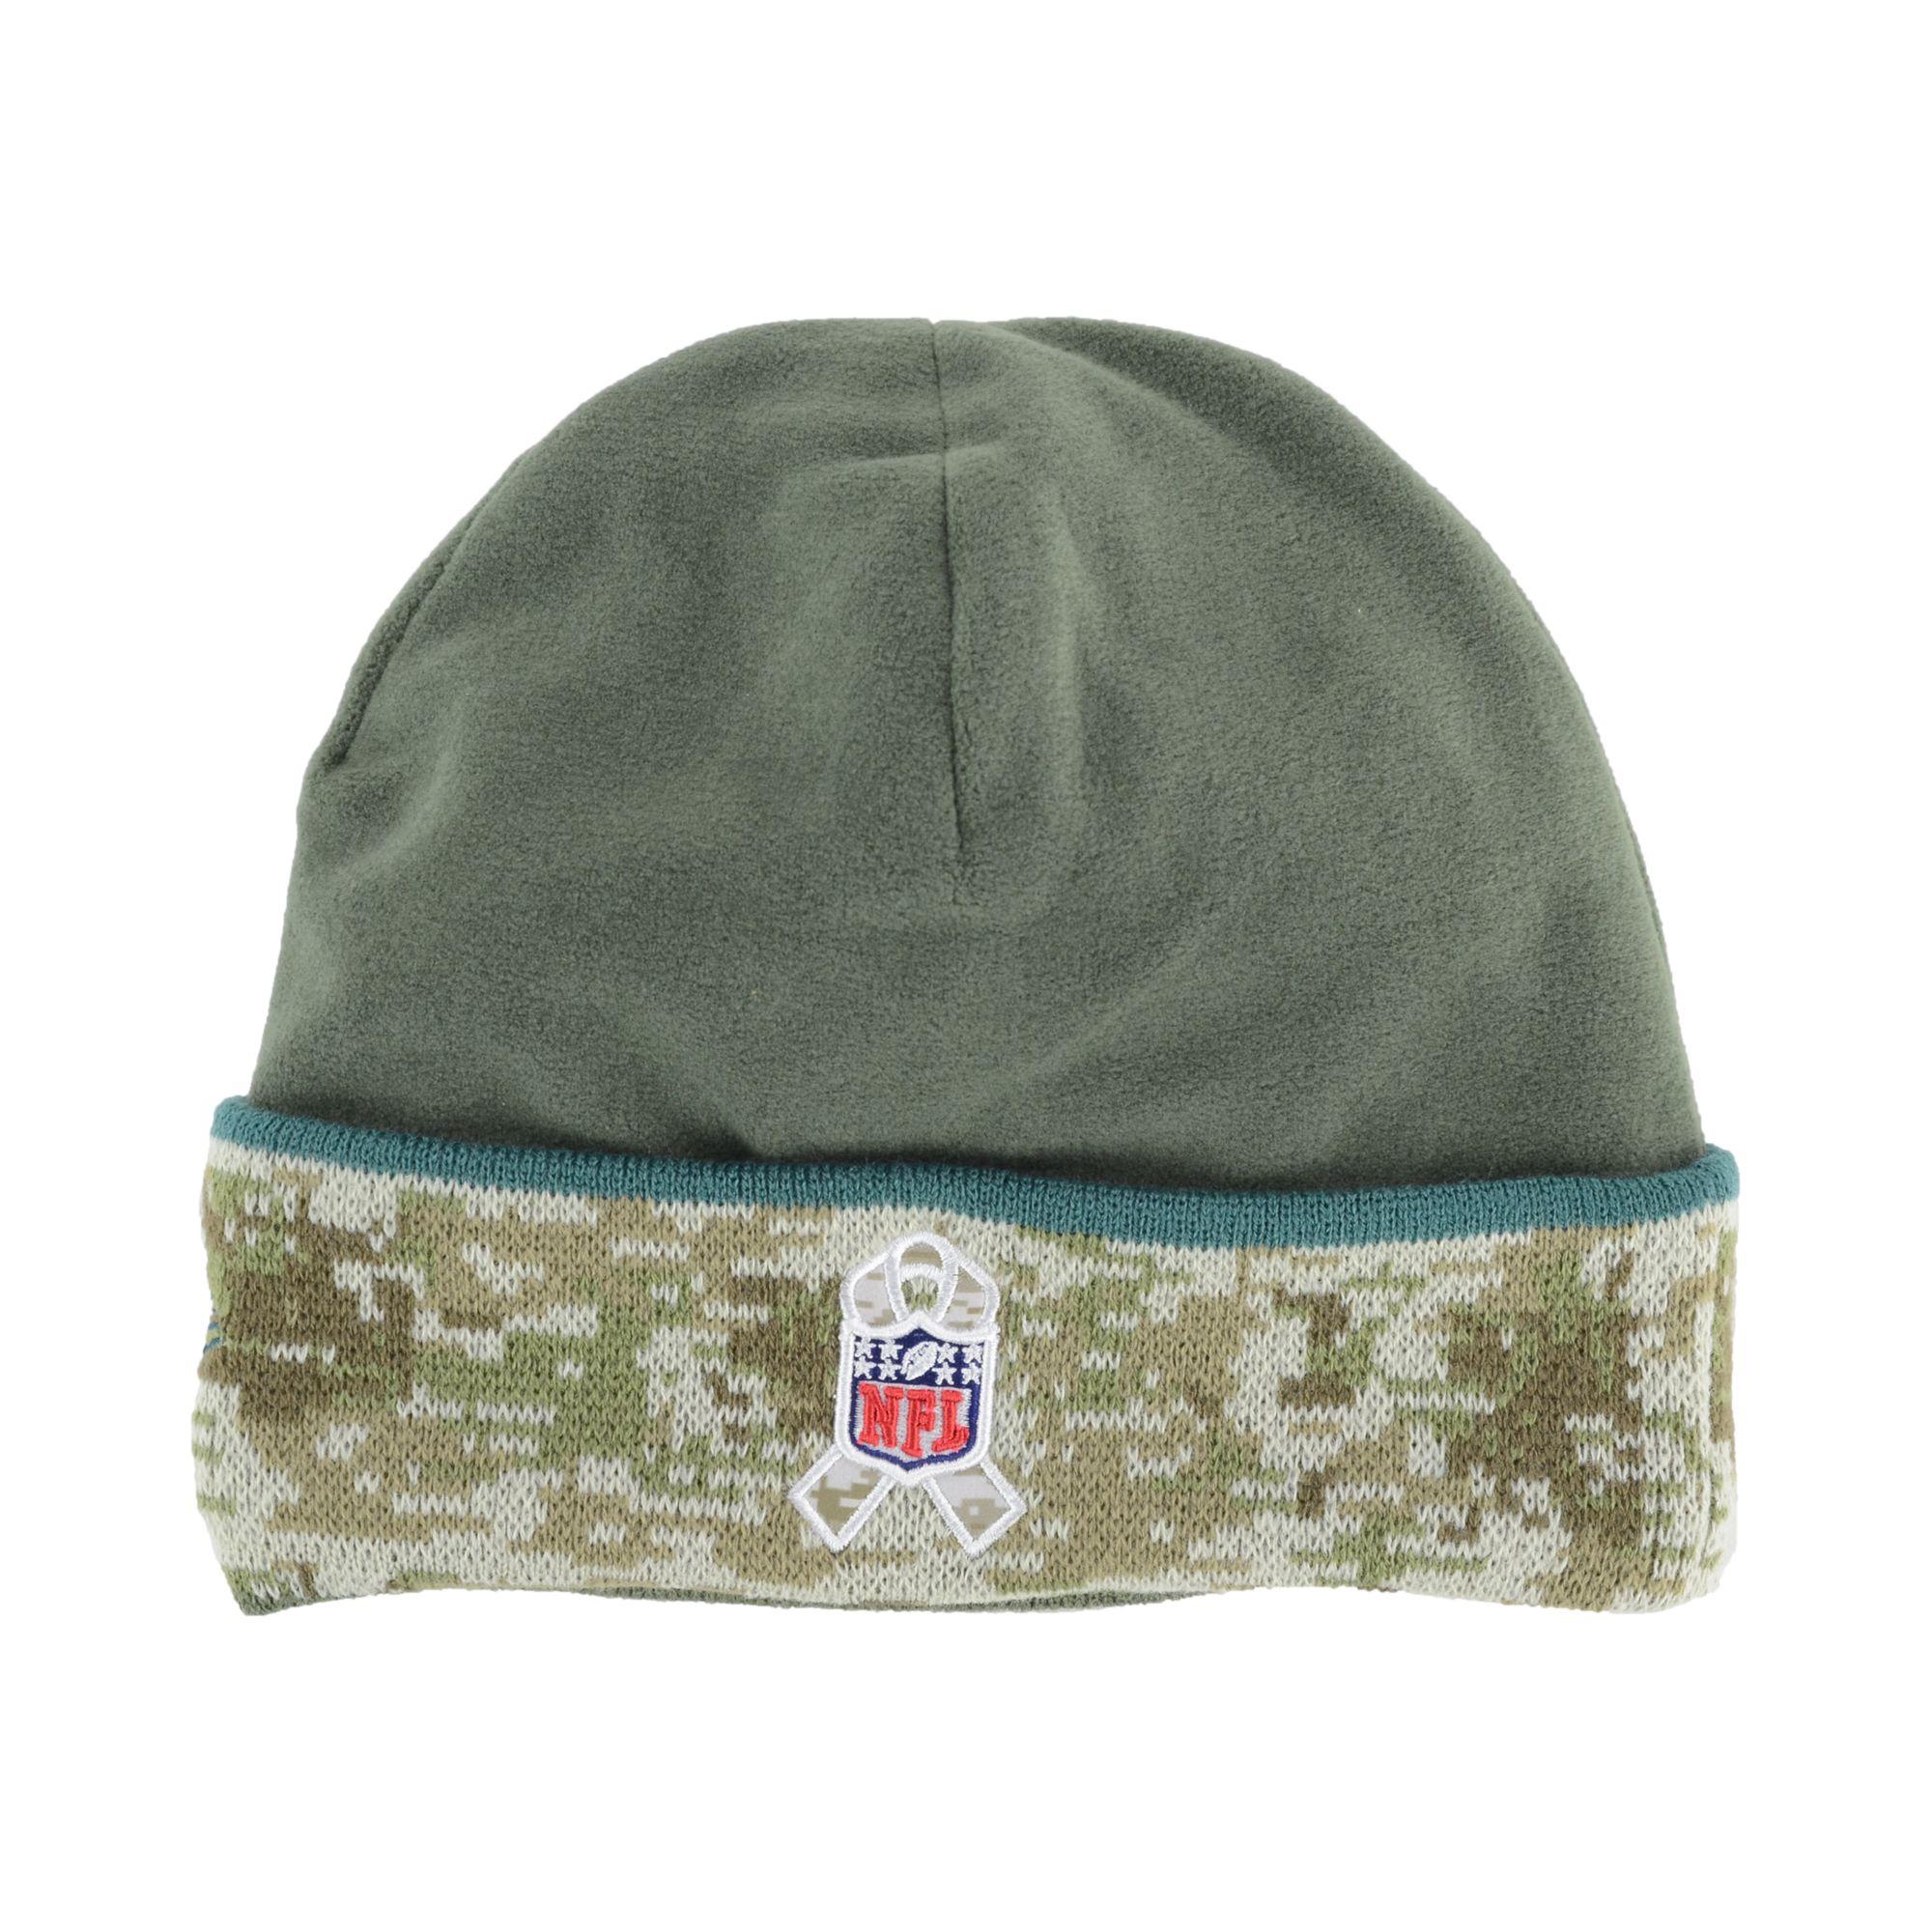 30abe38e4f0 Lyst - KTZ Philadelphia Eagles Salute To Service Knit Hat in Green ...